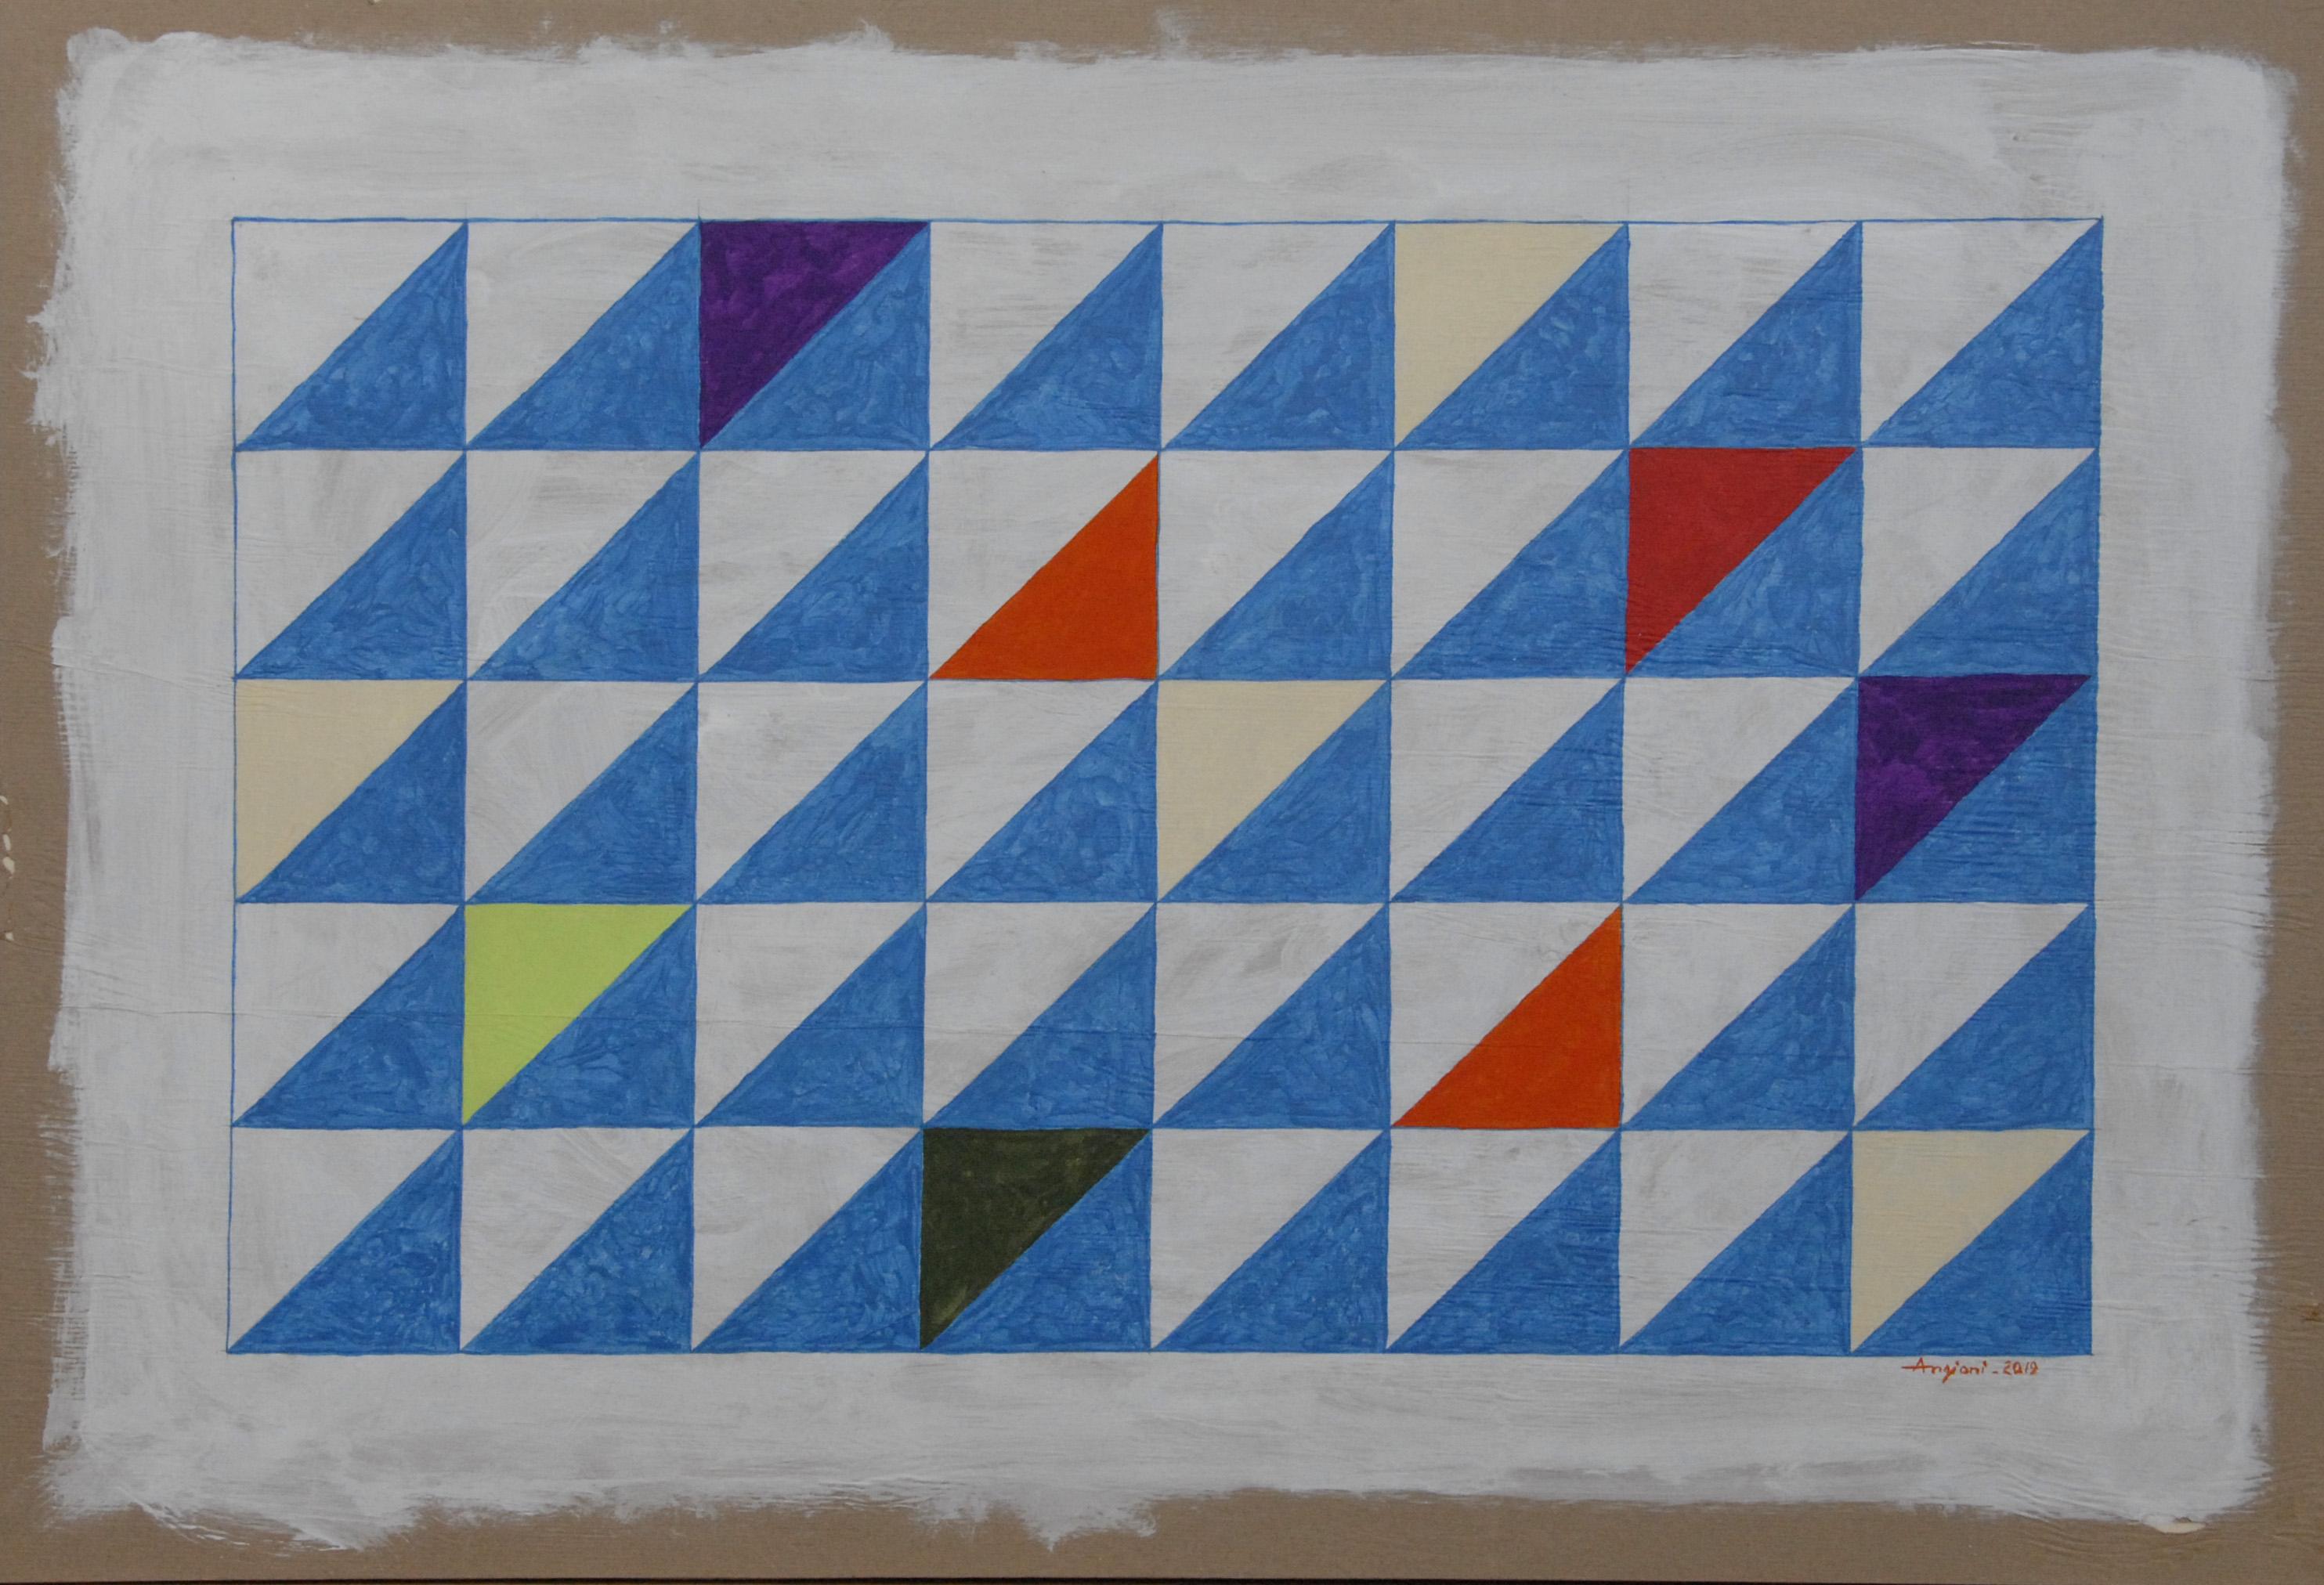 scansione geometrica, 2019, cm100xH70